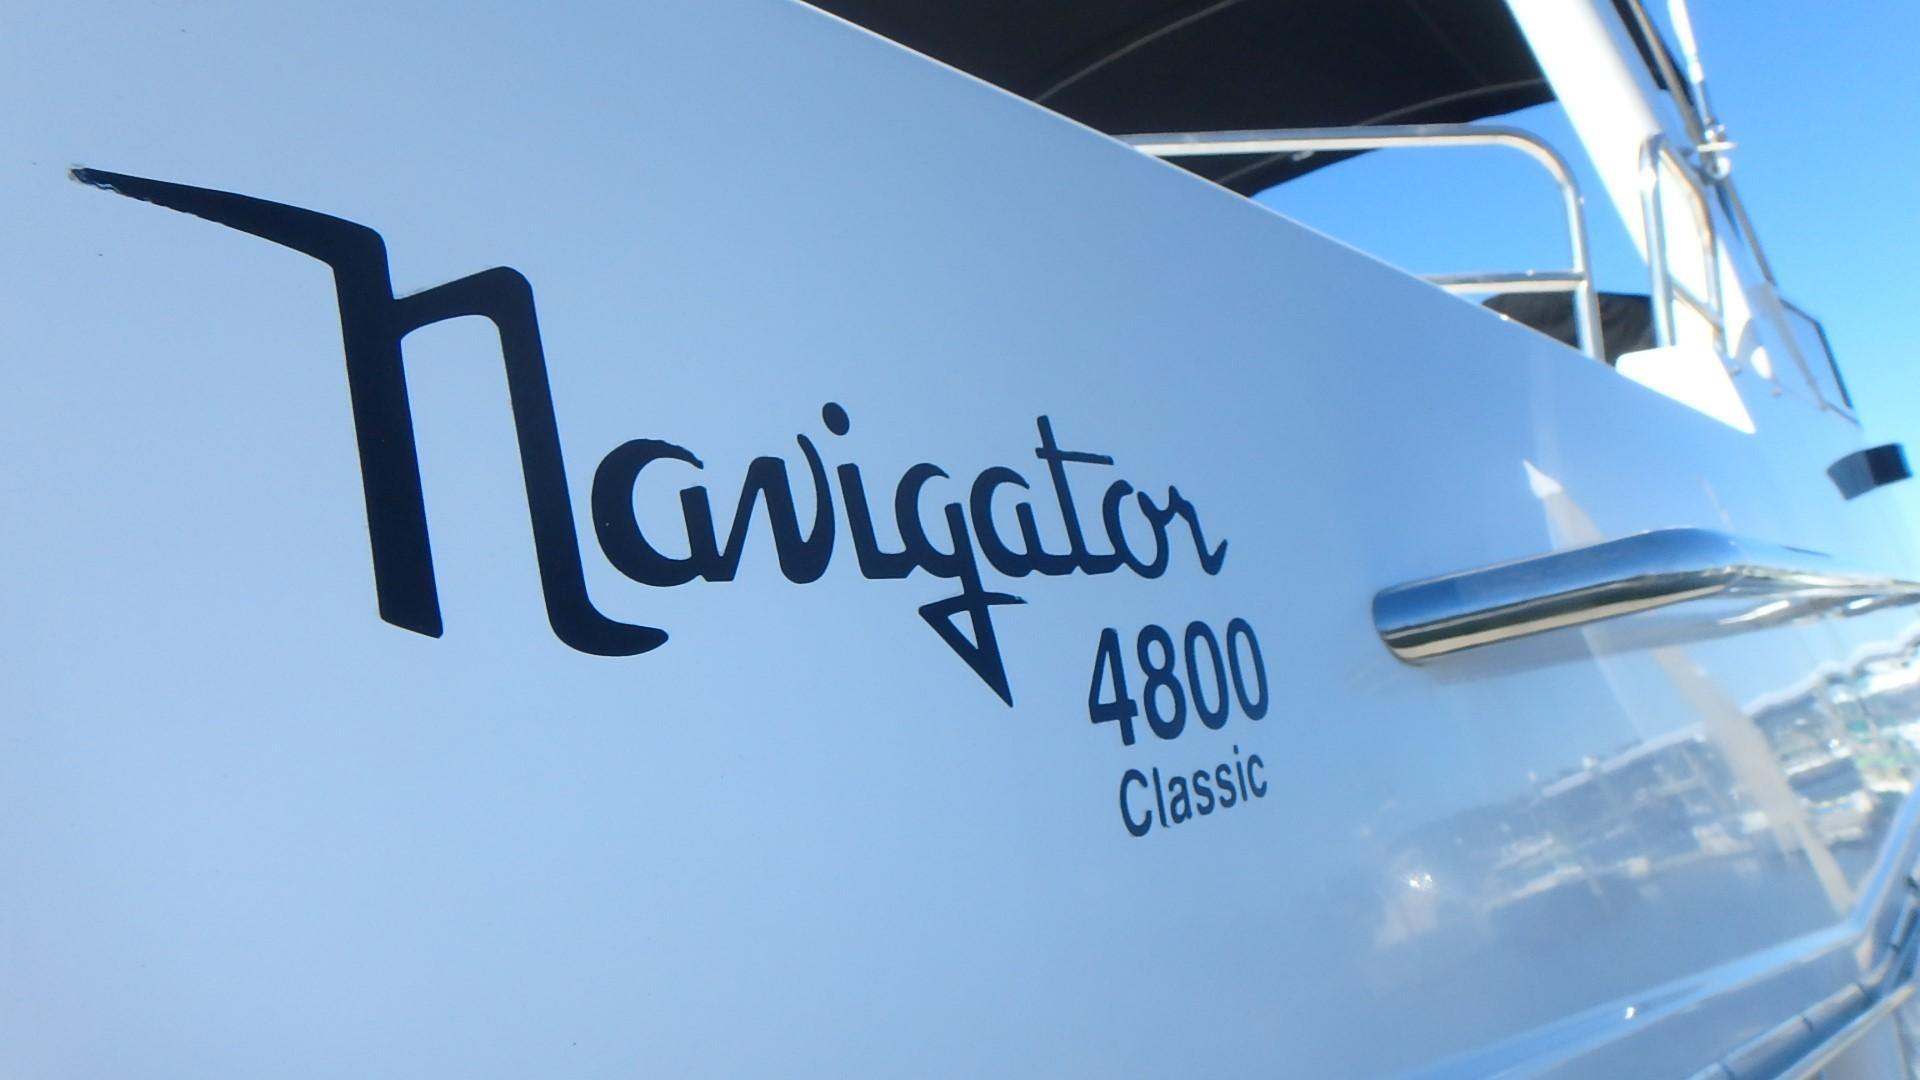 Navigator 4800 CLASSIC - Logo/Model